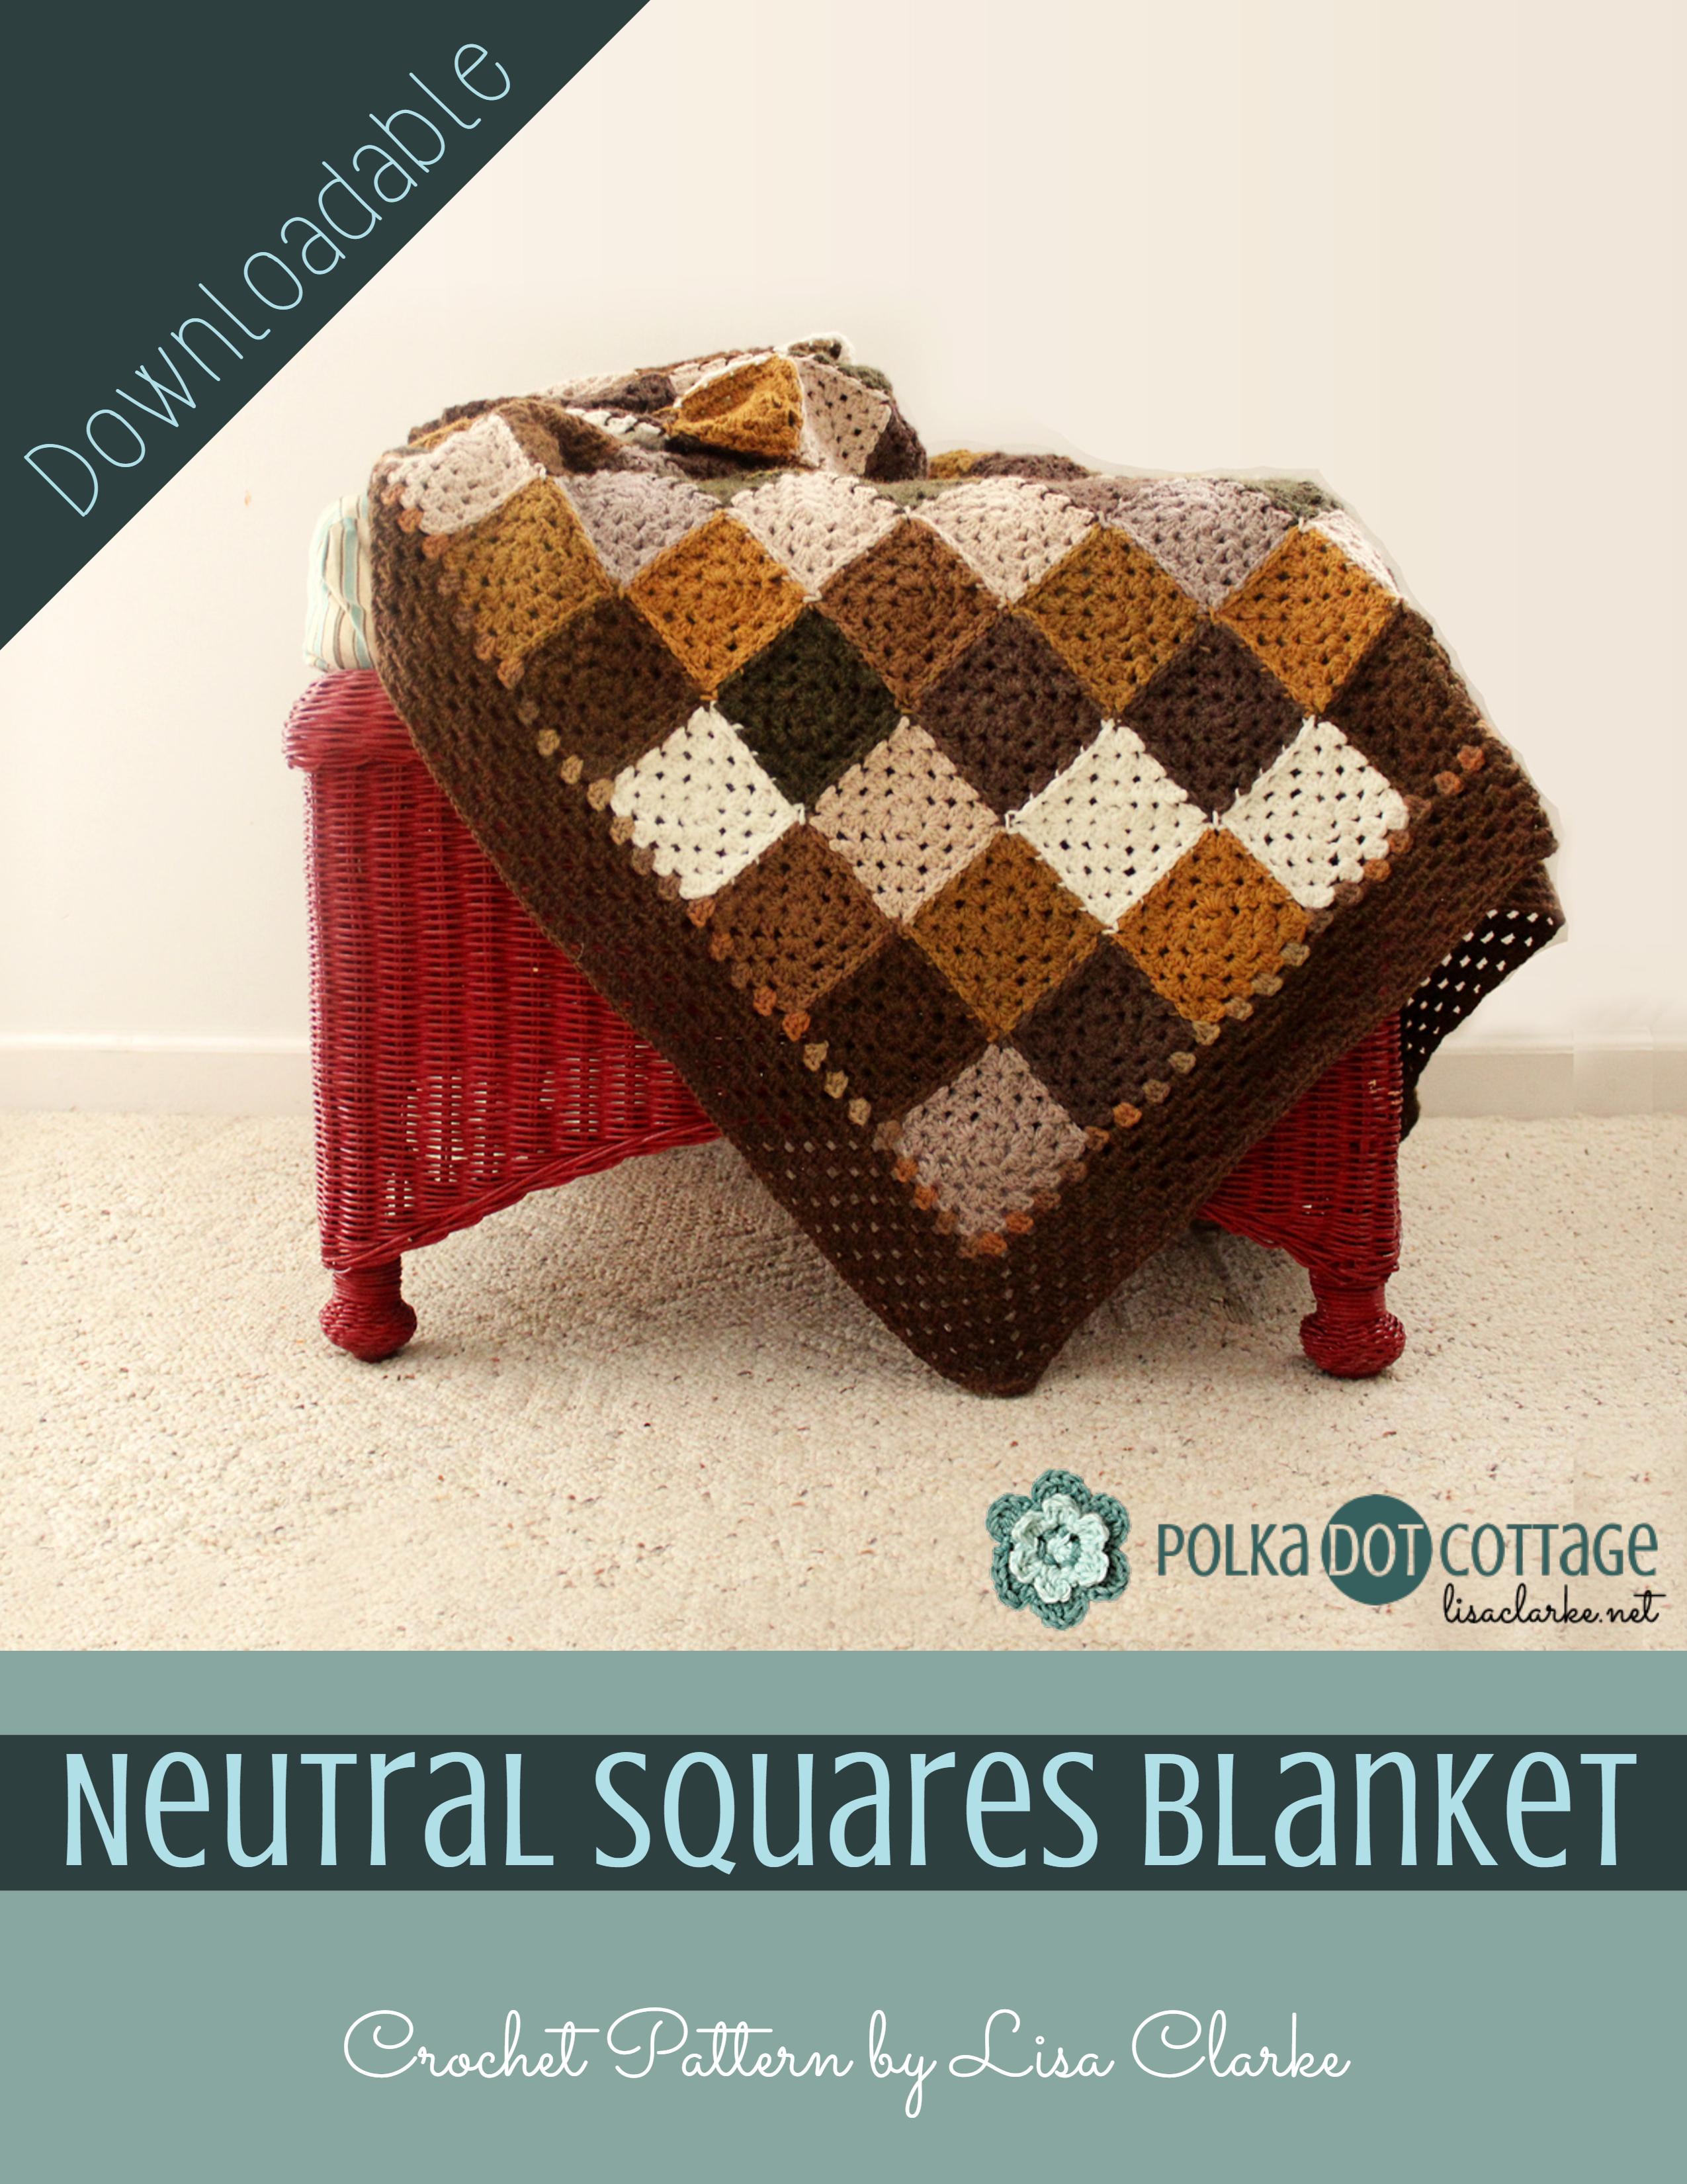 Neutral Squares Blanket Crochet Pattern Polka Dot Cottage,Smoked Prime Rib Roast Rub